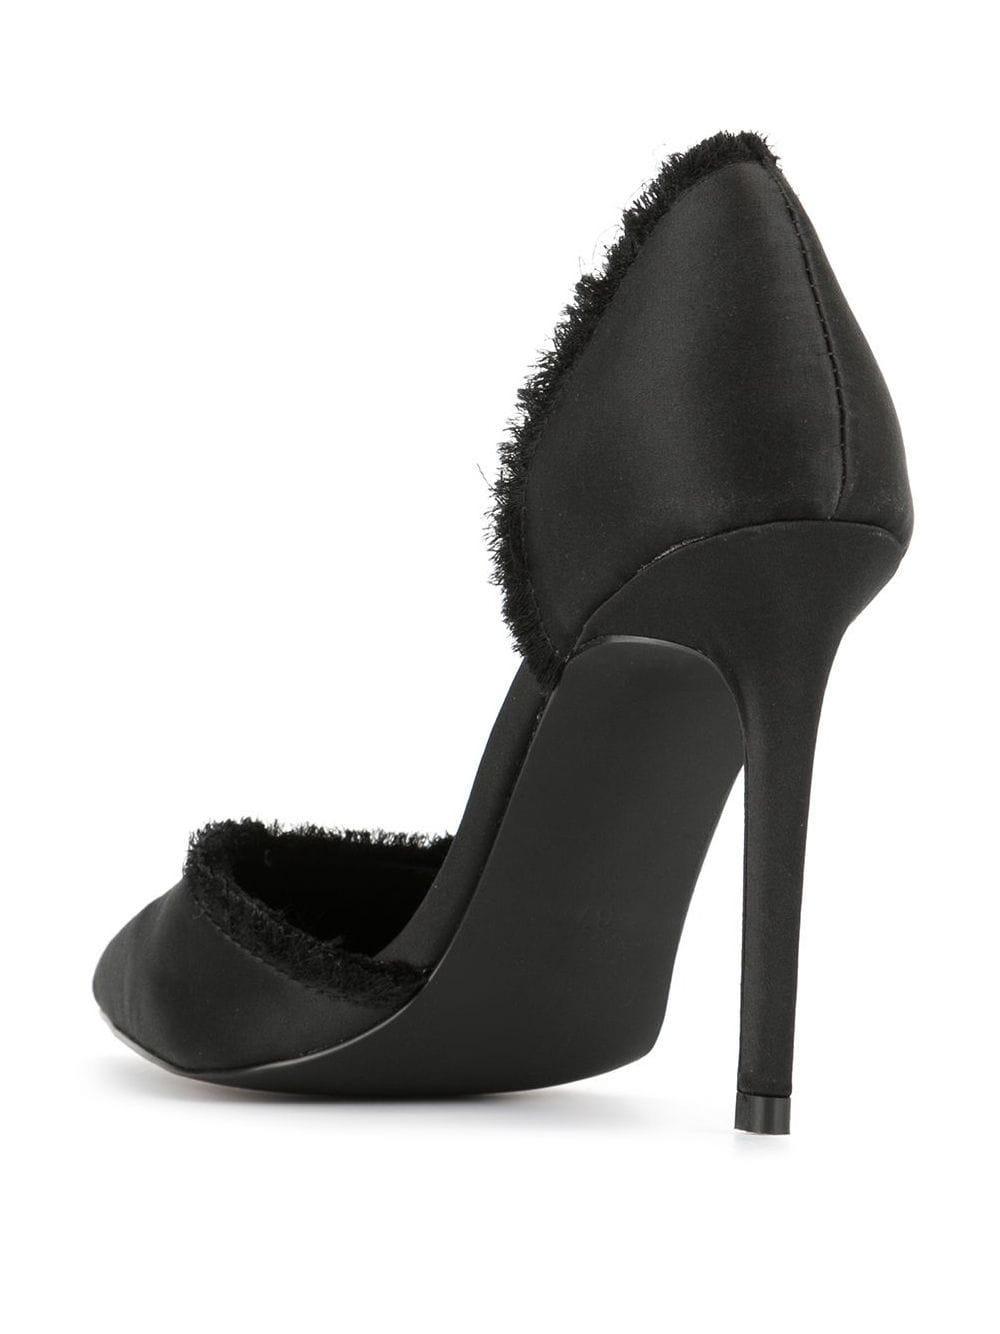 Zapatos de tacón Uffie I Senso de color Negro